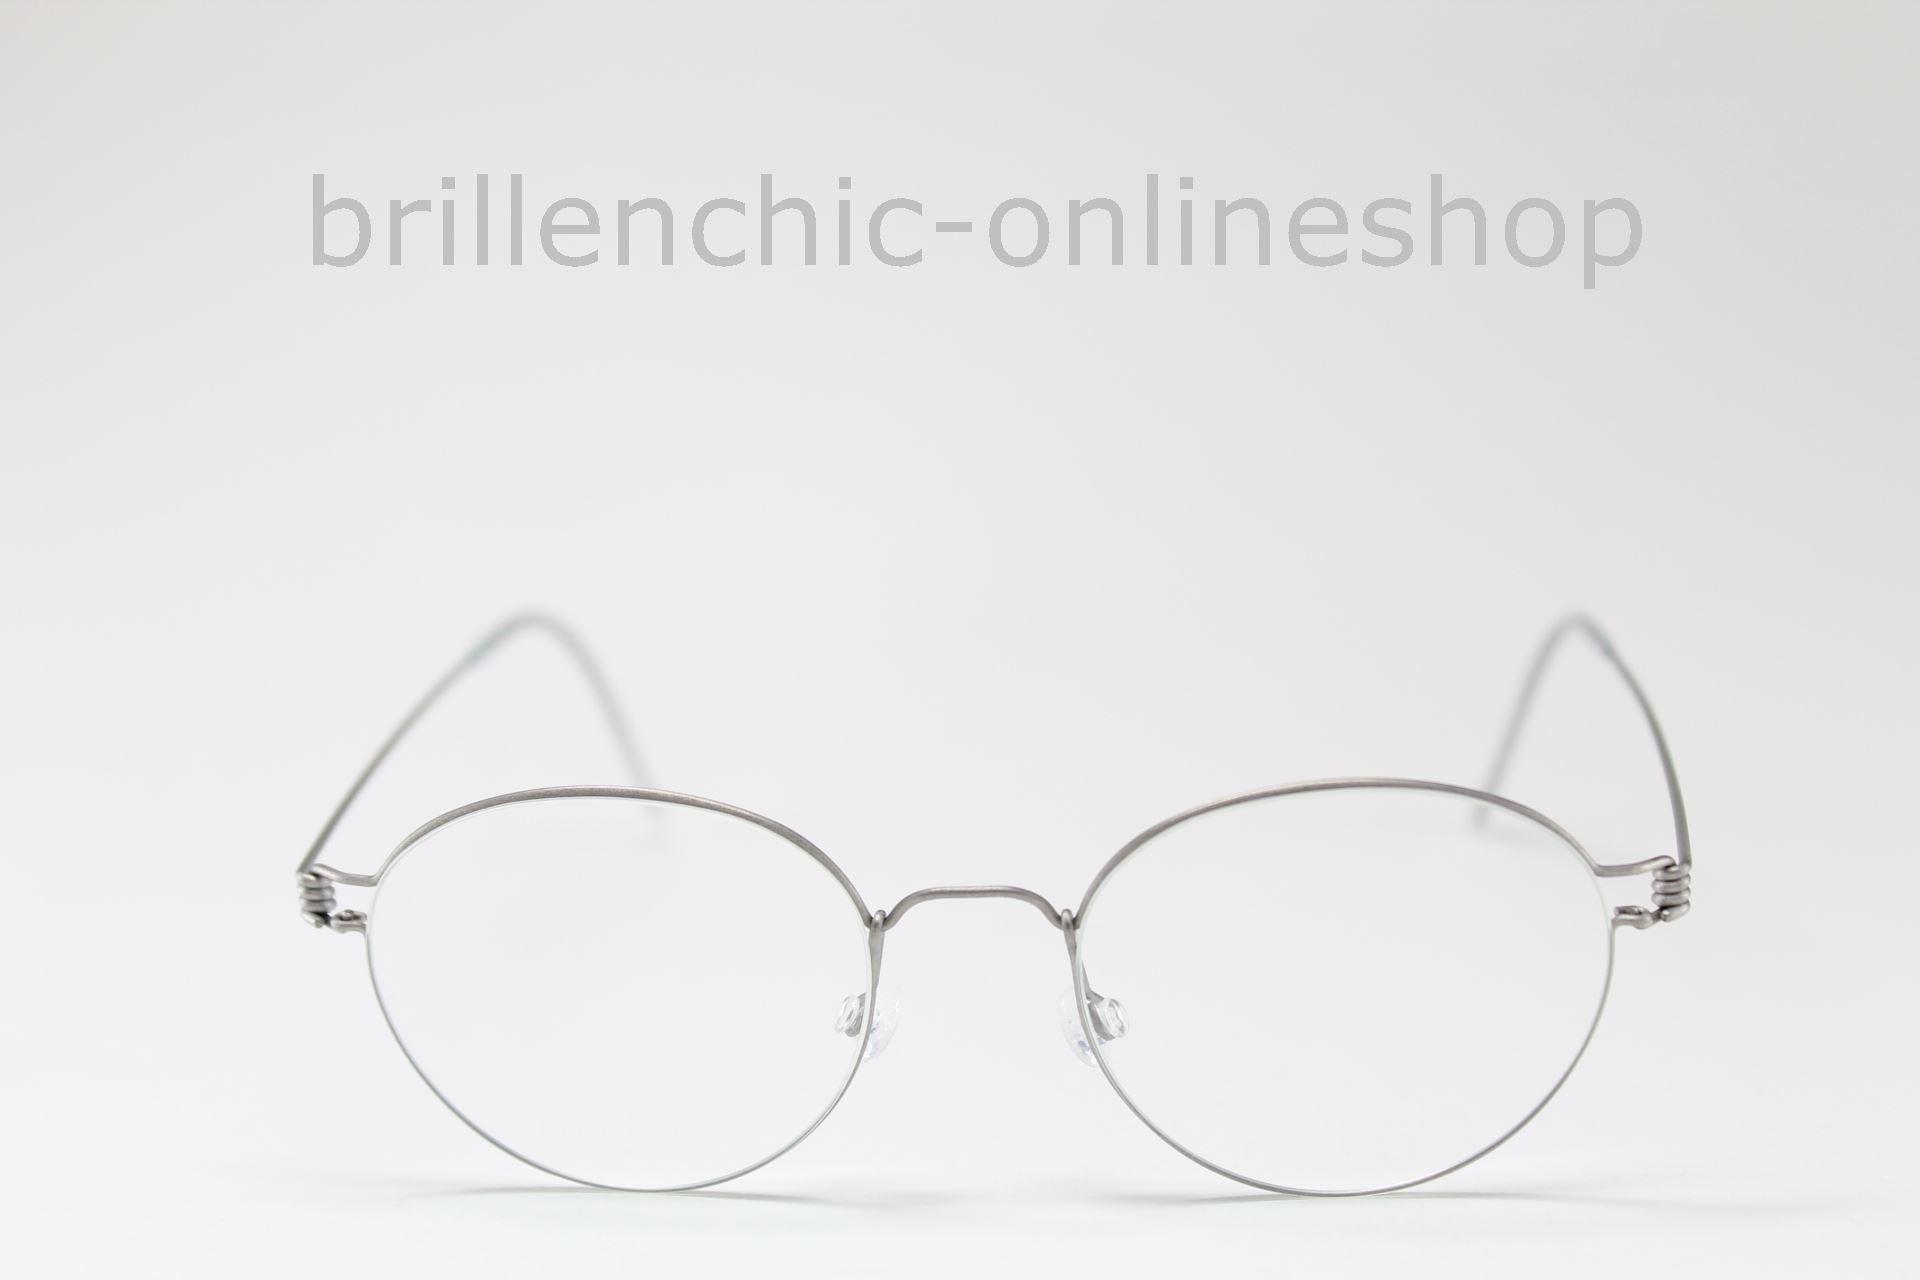 lindberg brillen